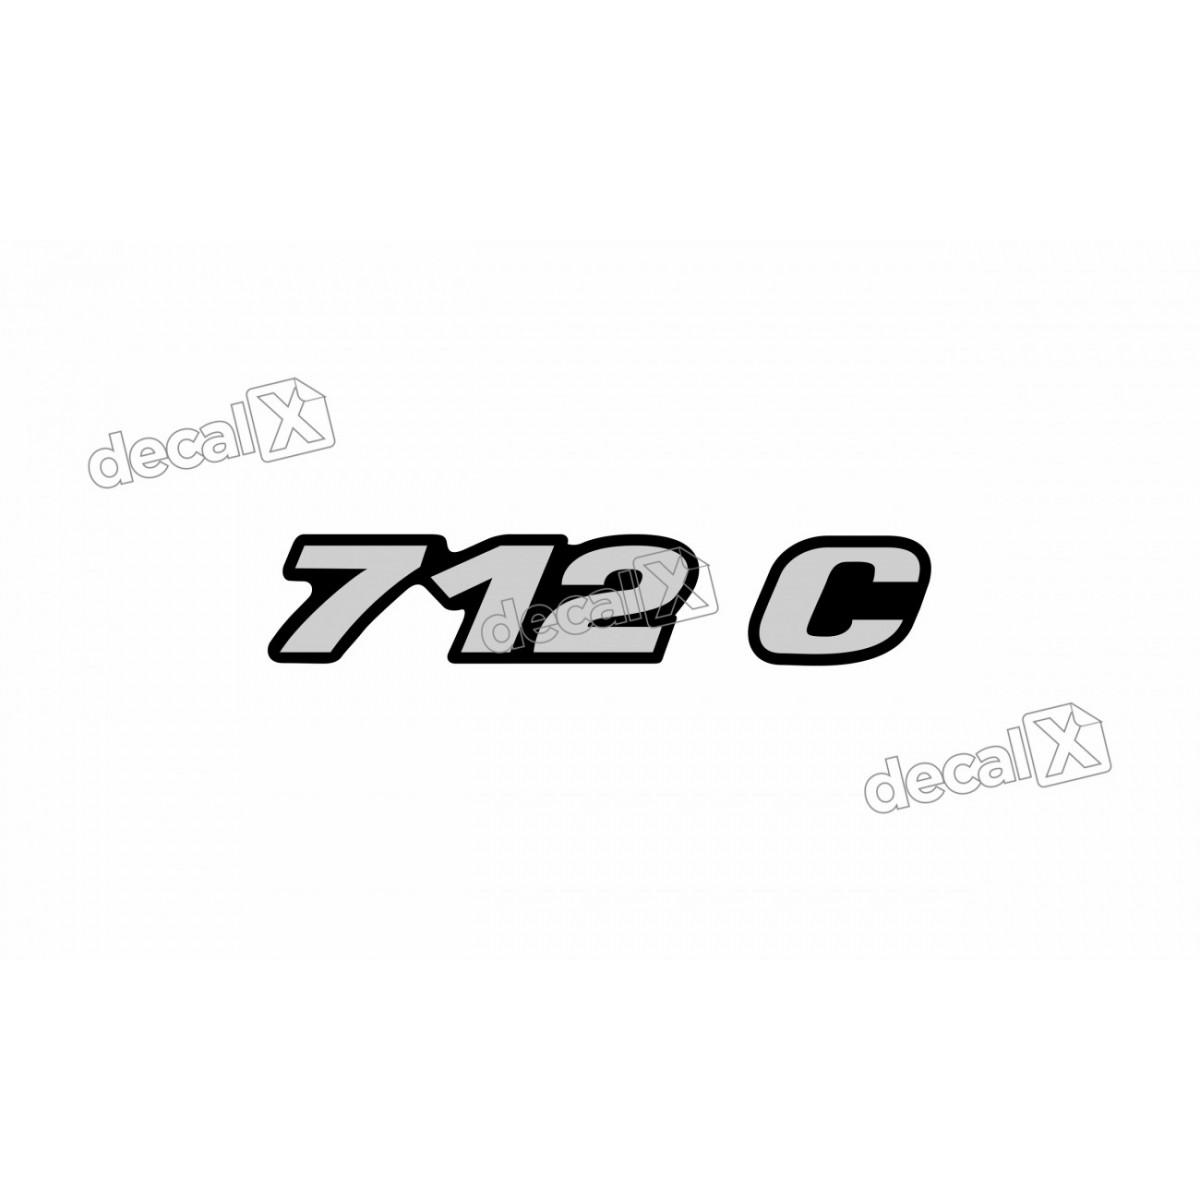 Adesivo Emblema Resinado Mercedes 712 C Cm8